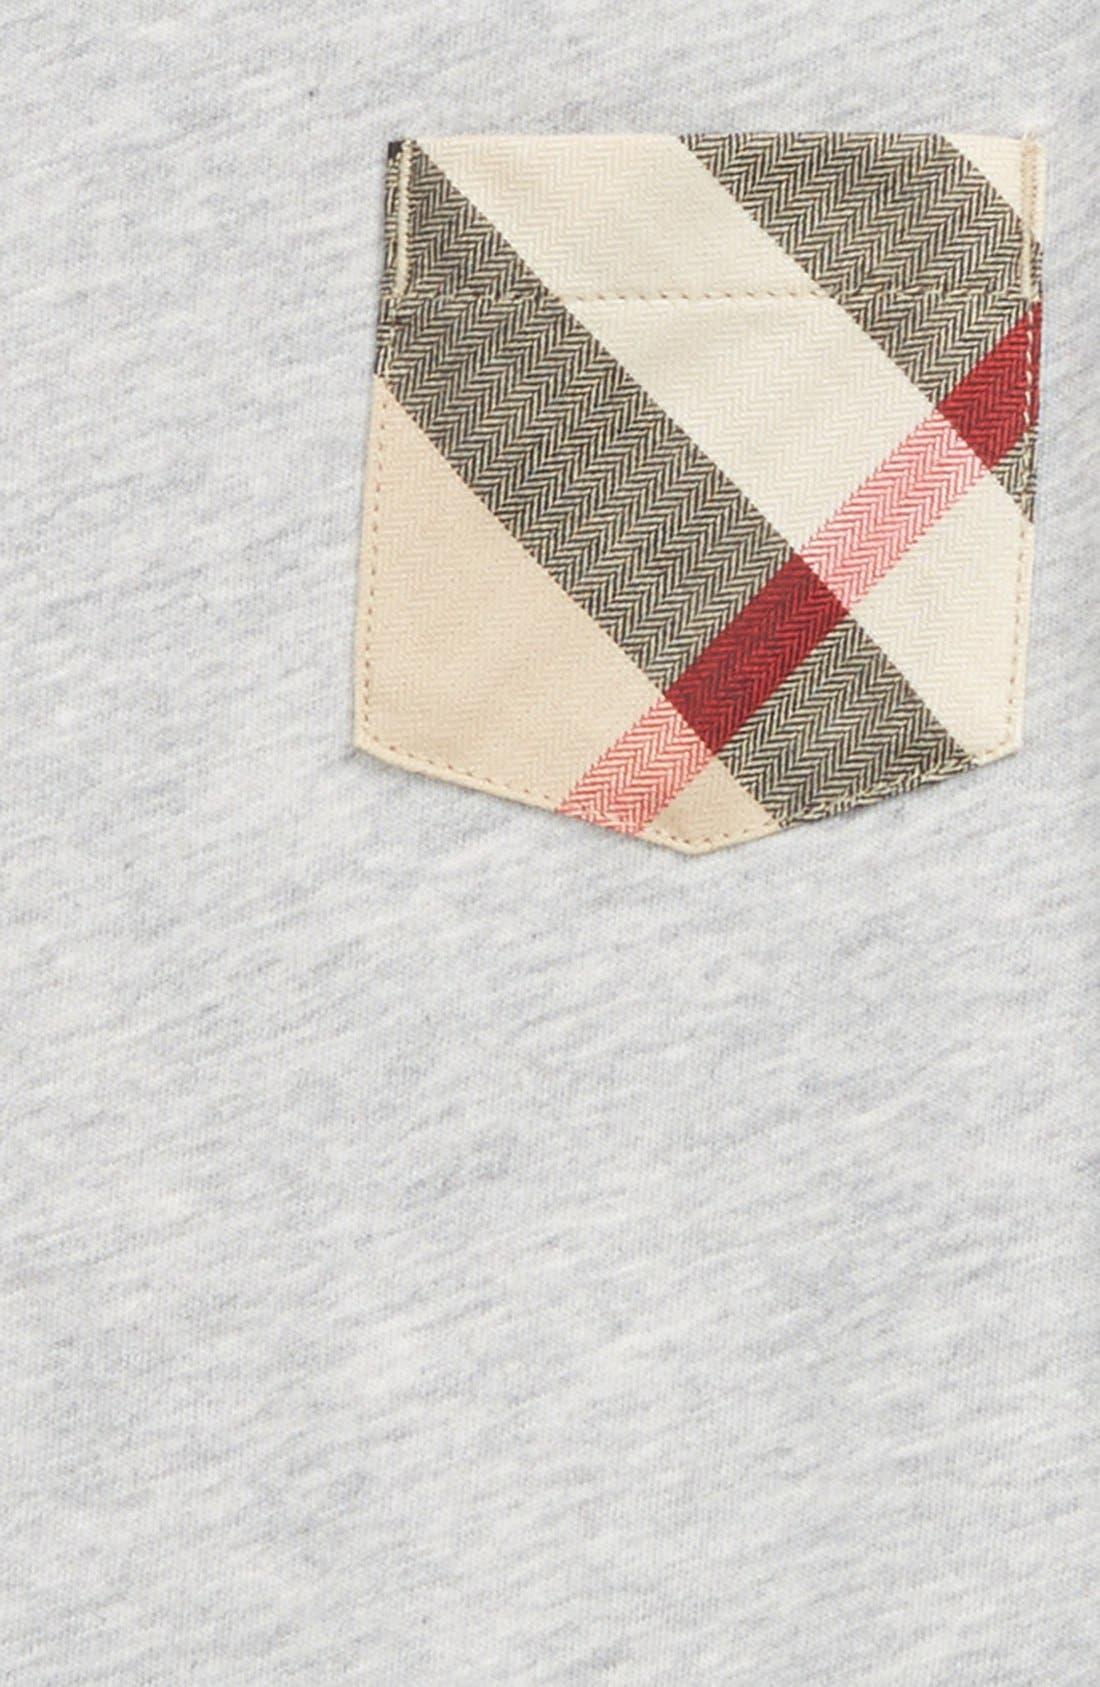 'Callum' Check Print Chest Pocket T-Shirt,                             Alternate thumbnail 3, color,                             035